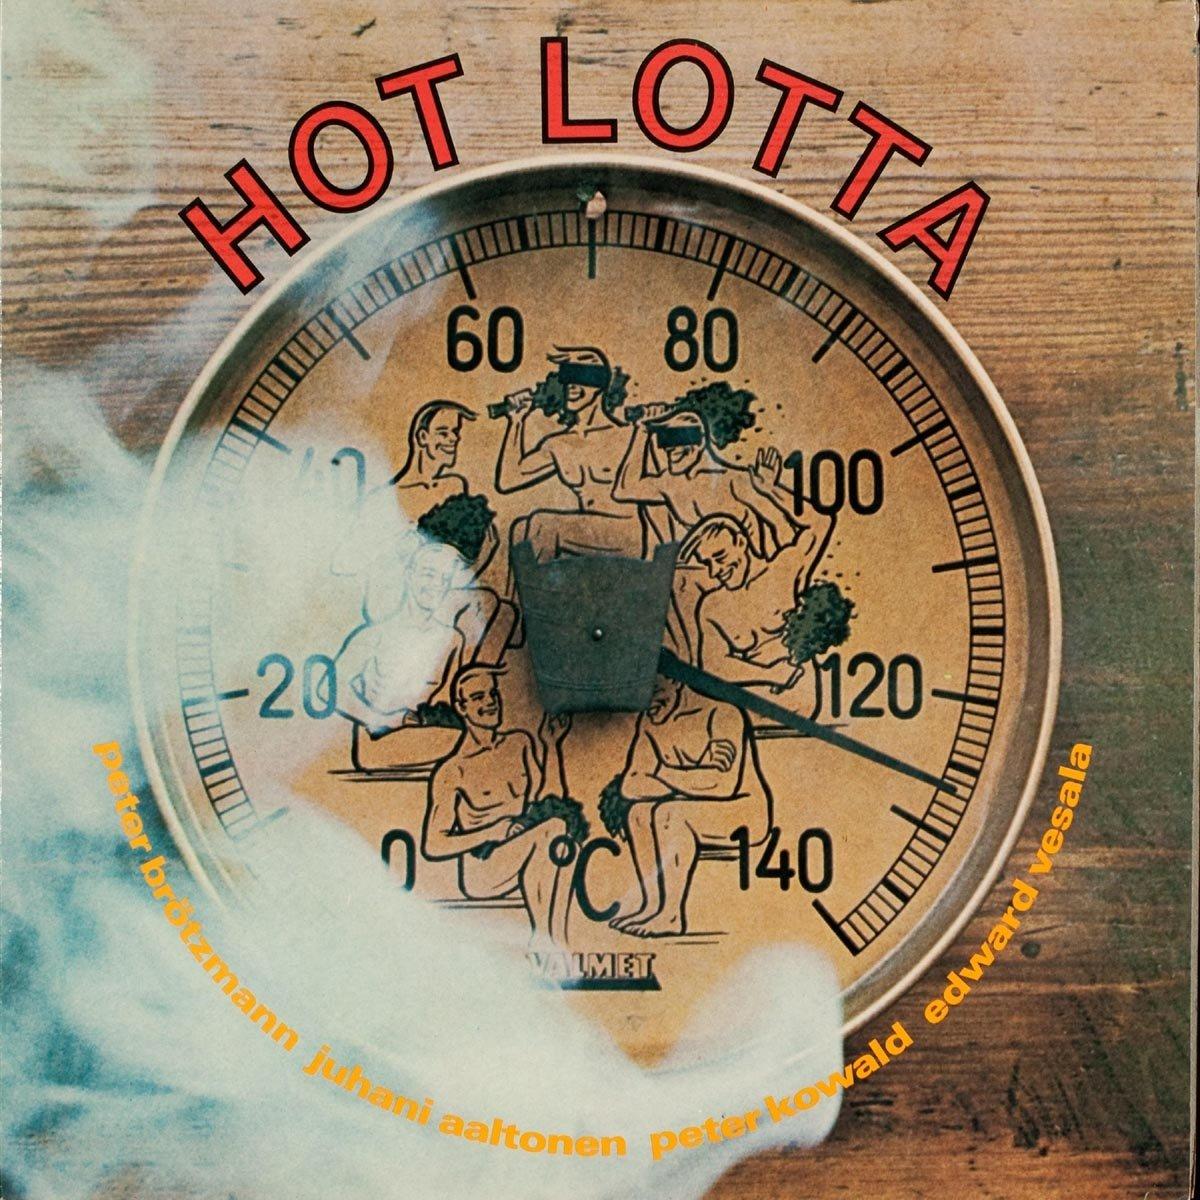 Vinilo : Brotzmann, Peter / Aaltonen / Kowald / Vesala - Hot Lotta (United Kingdom - Import, 2PC)